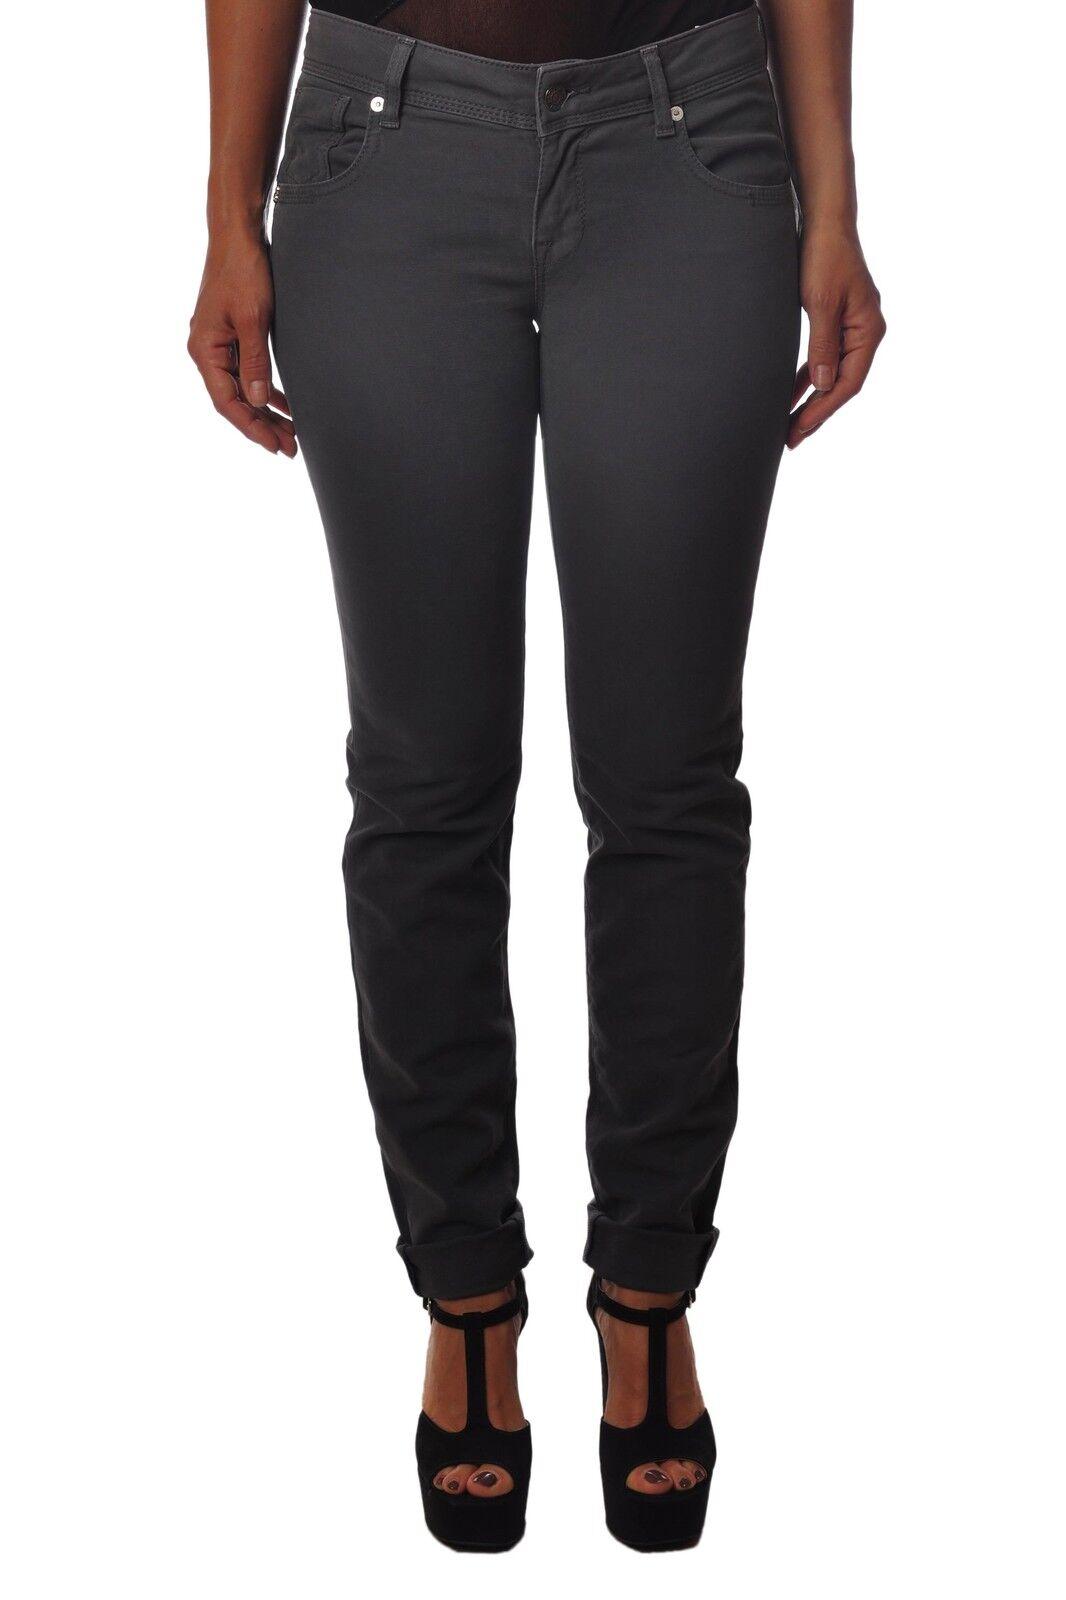 Latinò  -  Pants - Female - Grey - 3821529A181827